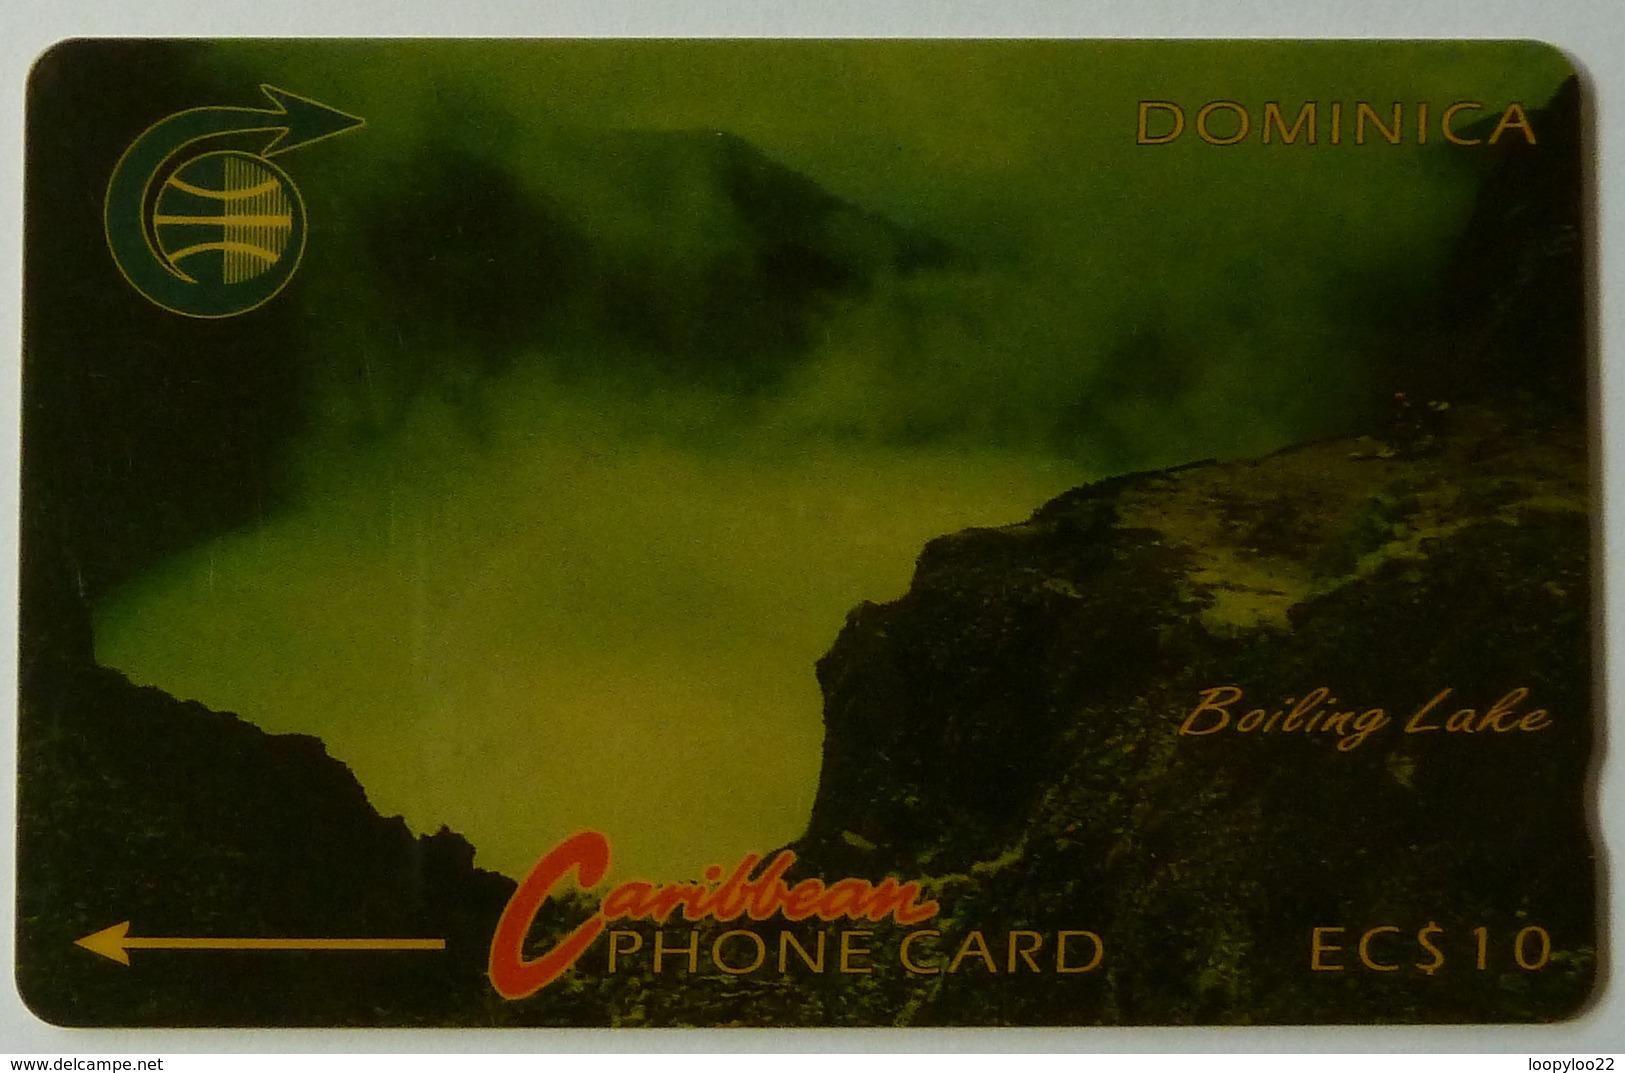 DOMINICA - GPT - 4CDMA - $10 - DOM-4A - Boiling Lake - White Strip - Used - Dominica